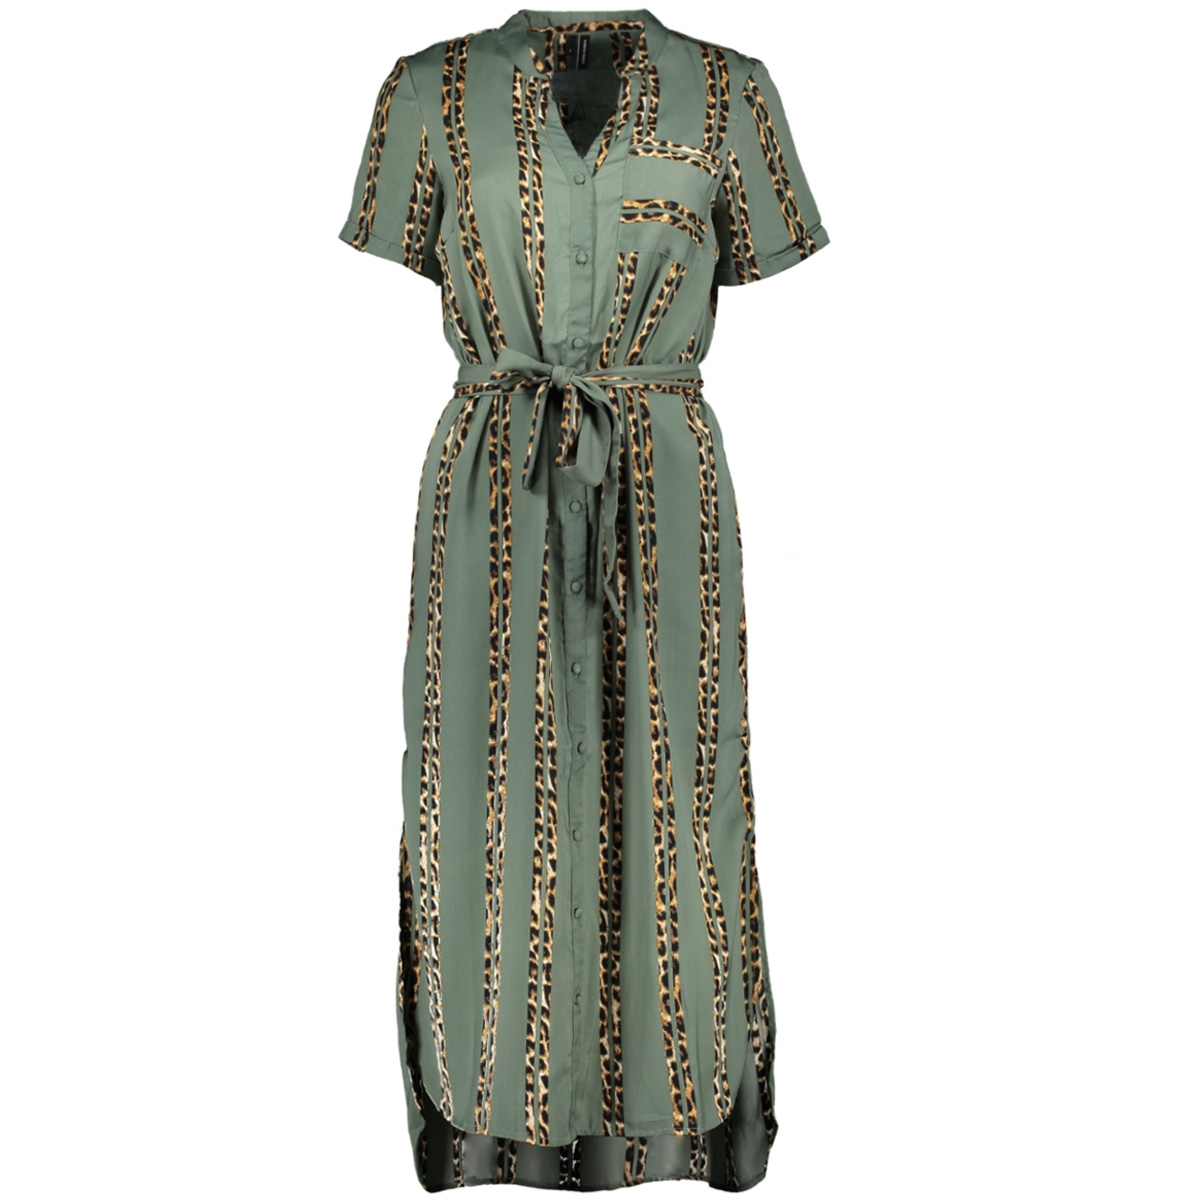 vmdalion s/s slit shirt dress exp 10210858 vero moda jurk laurel wreath